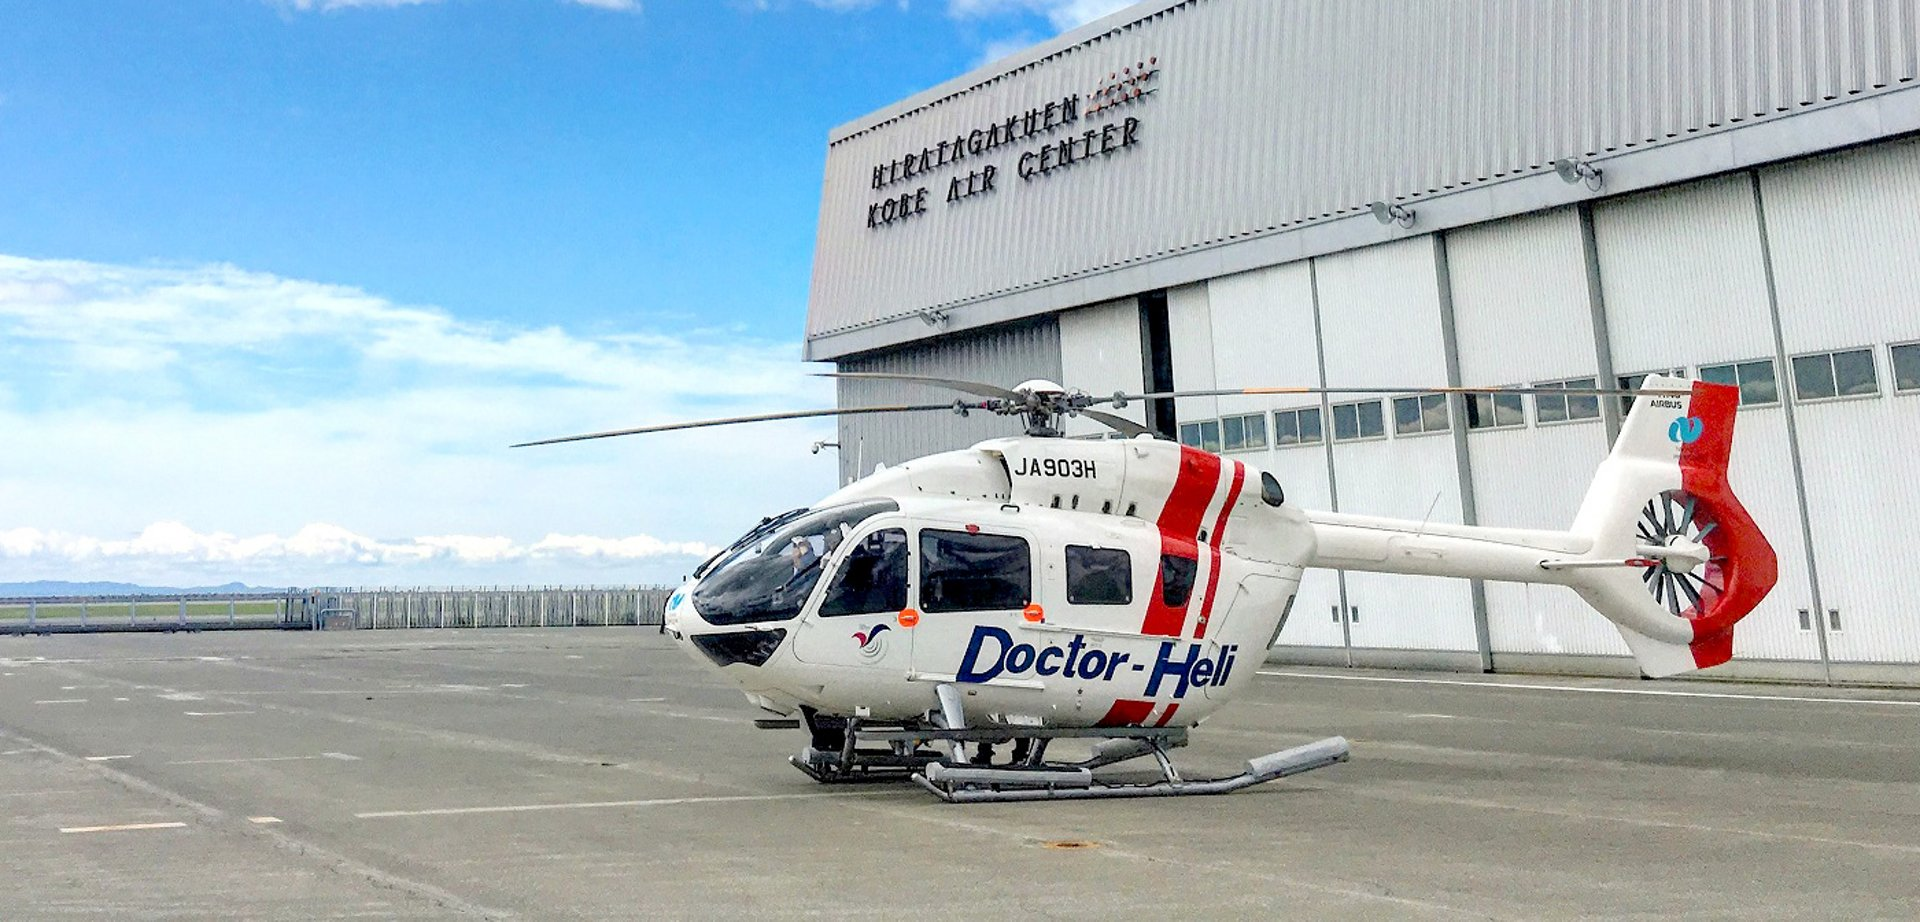 Hiratagakuen strengthens Japan's aeromedical operations with Airbus fleet